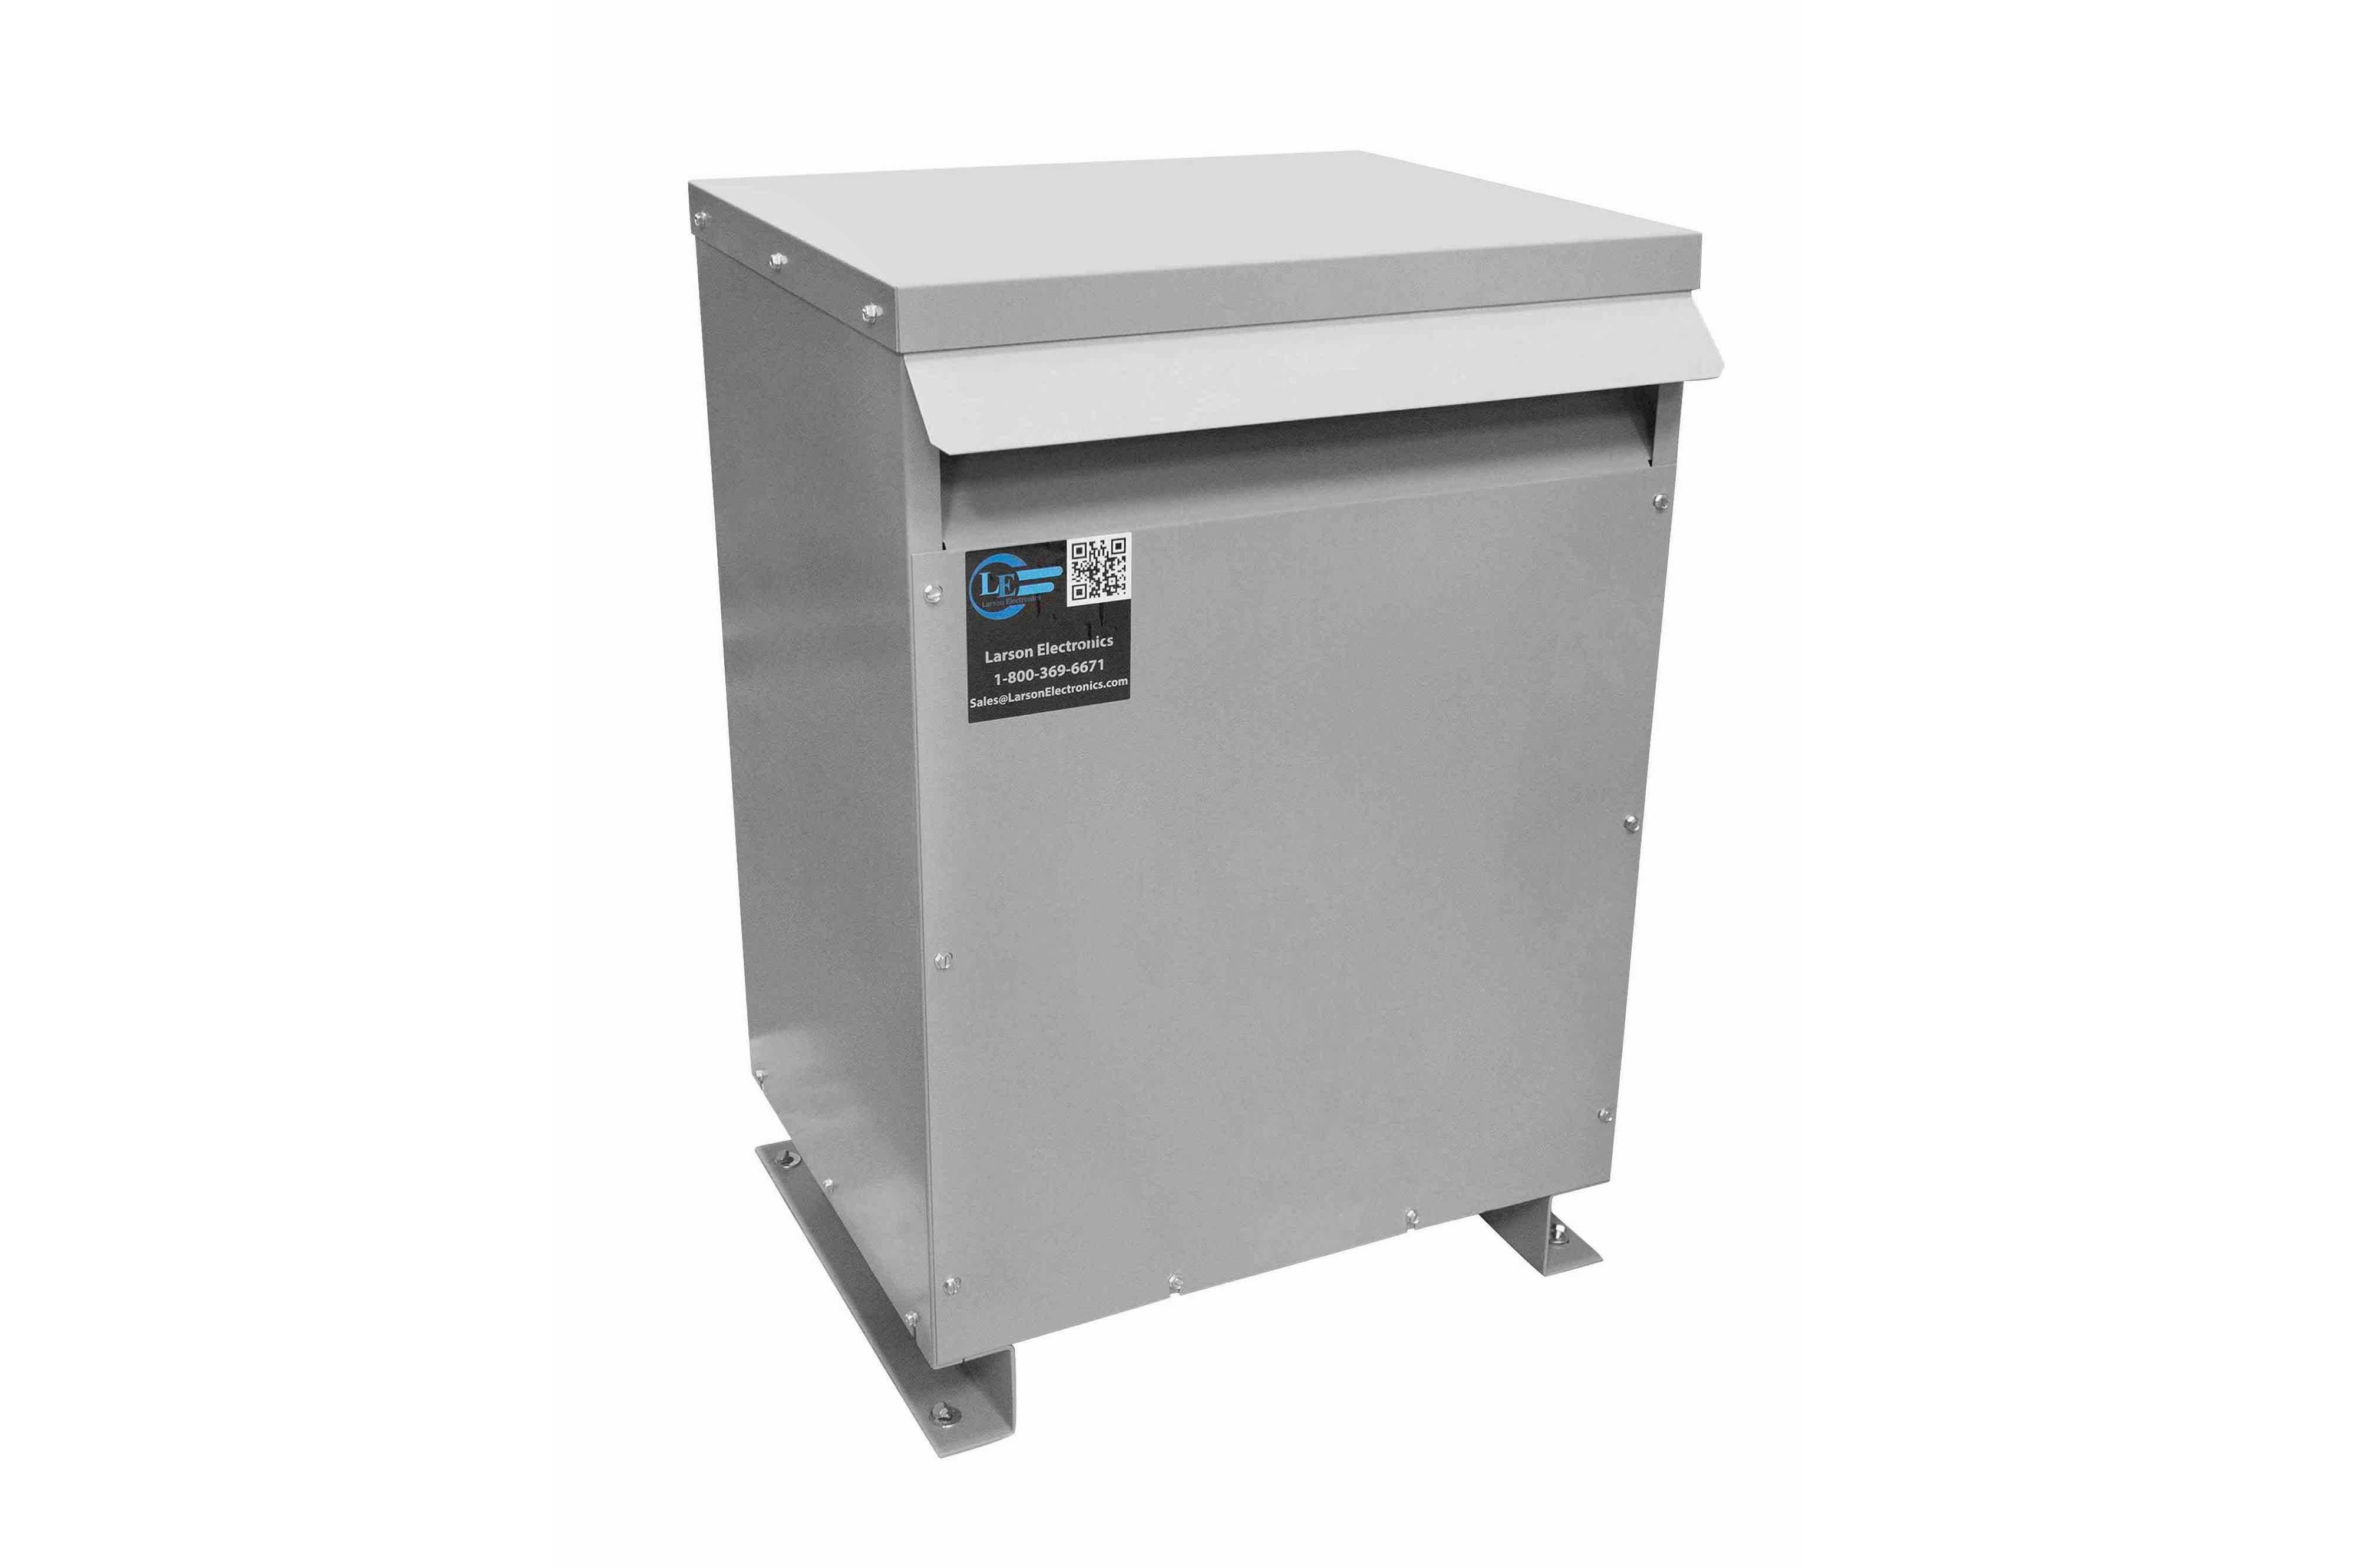 175 kVA 3PH Isolation Transformer, 440V Wye Primary, 240V/120 Delta Secondary, N3R, Ventilated, 60 Hz